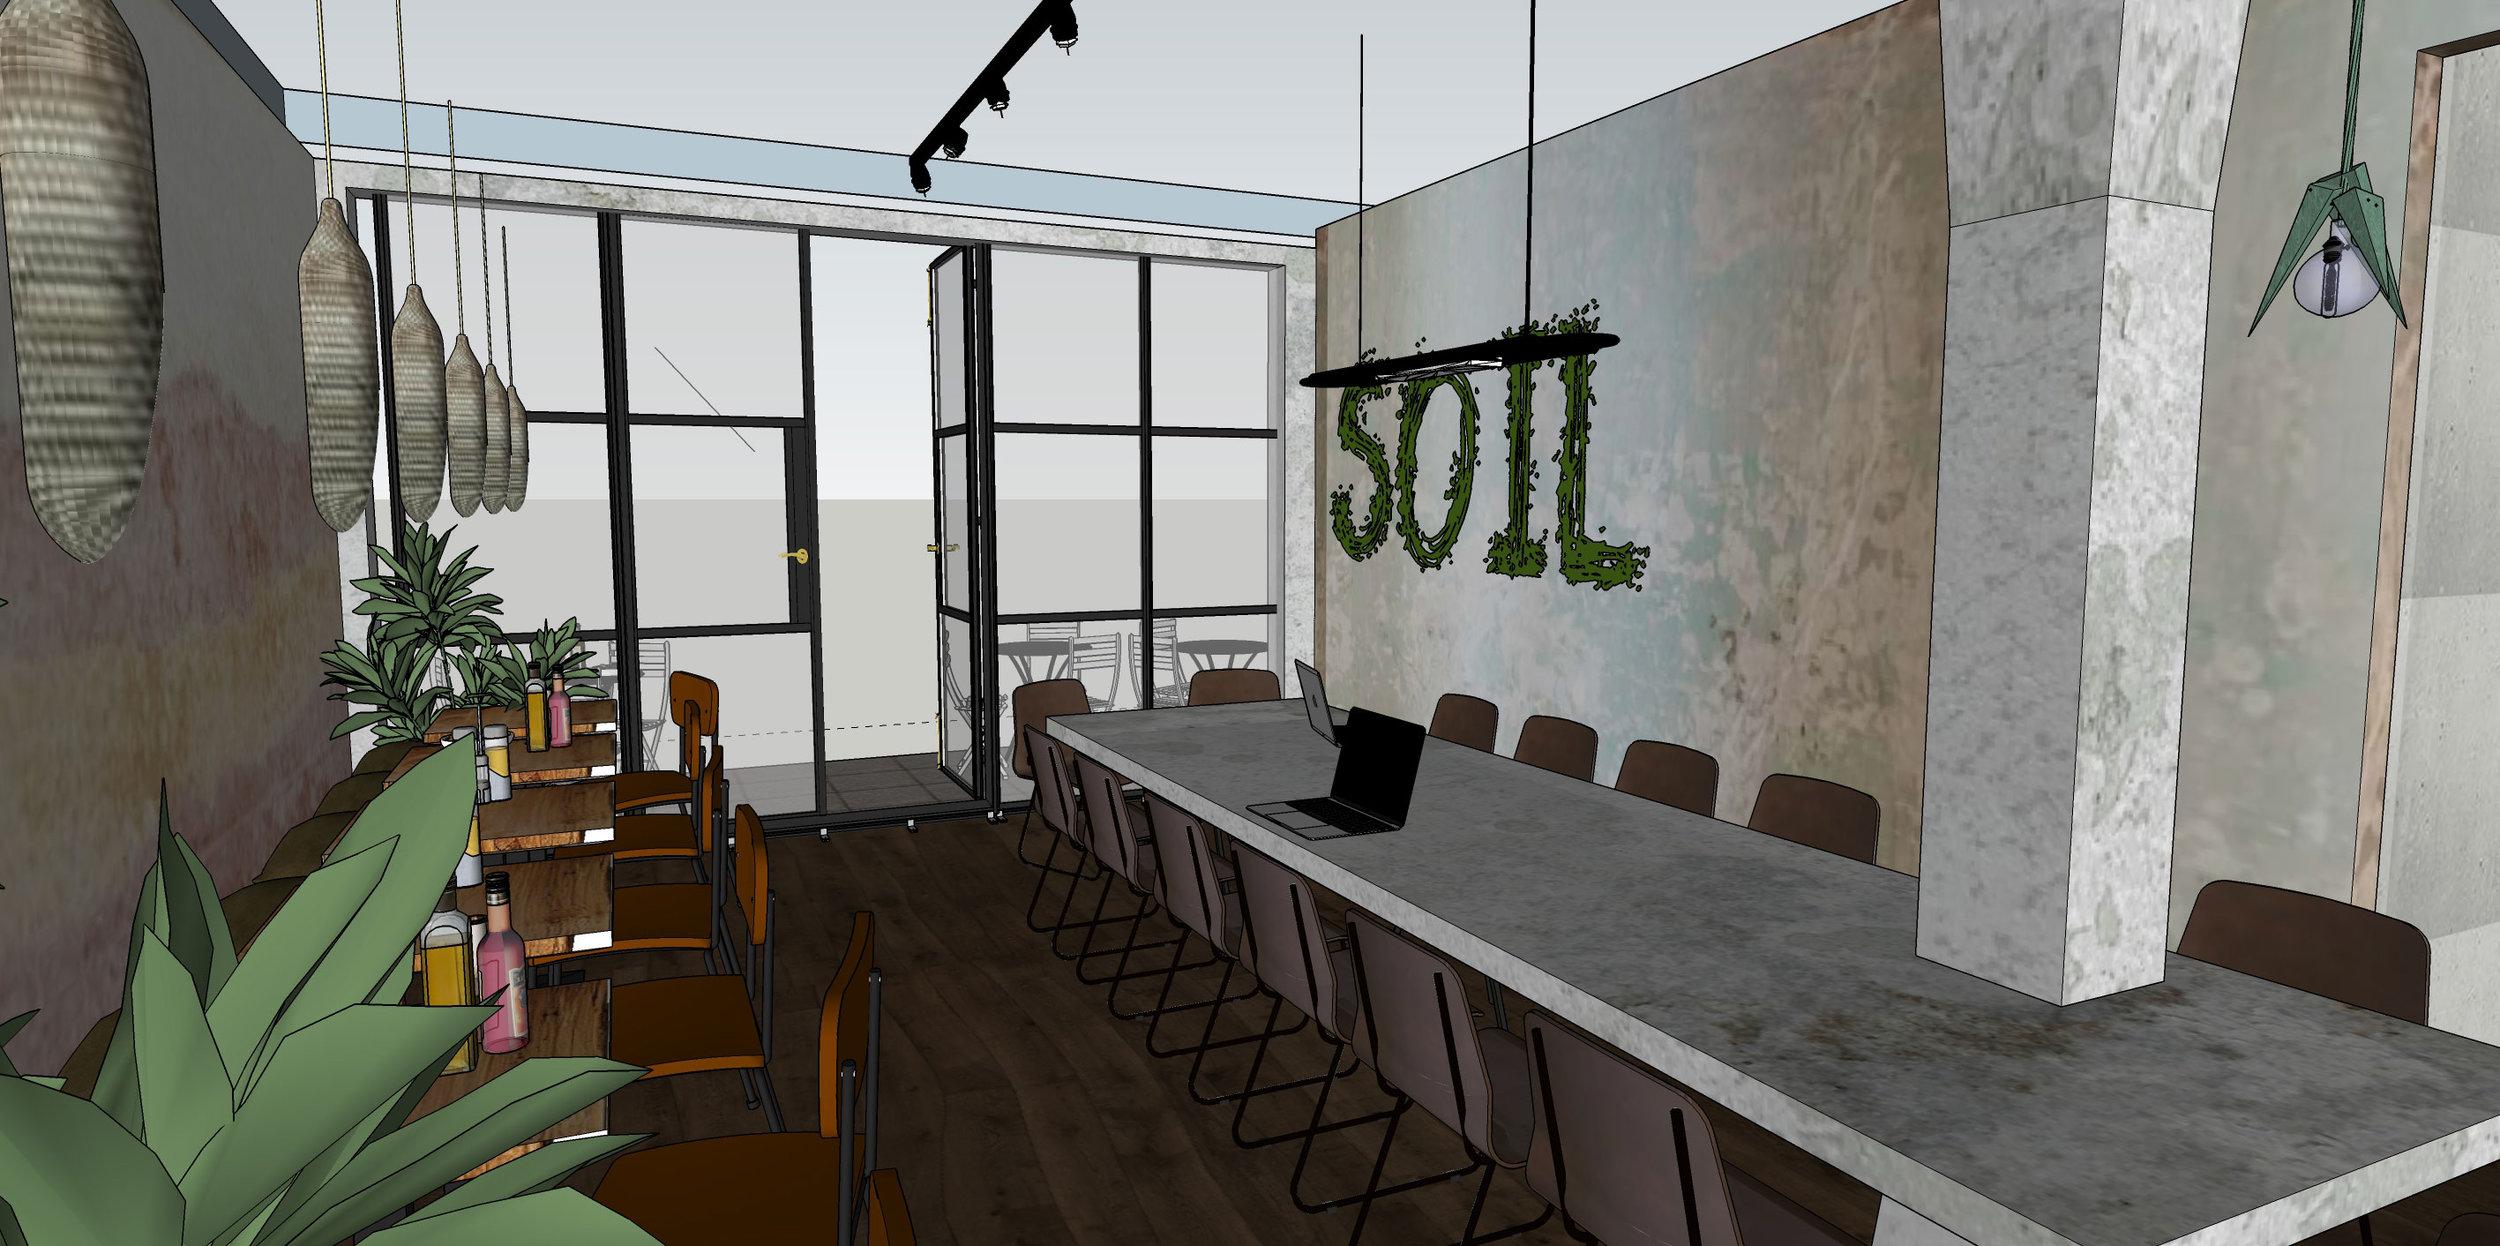 StudioNoun-InteriorDesignProject-Restaurant-Soil_8.jpg